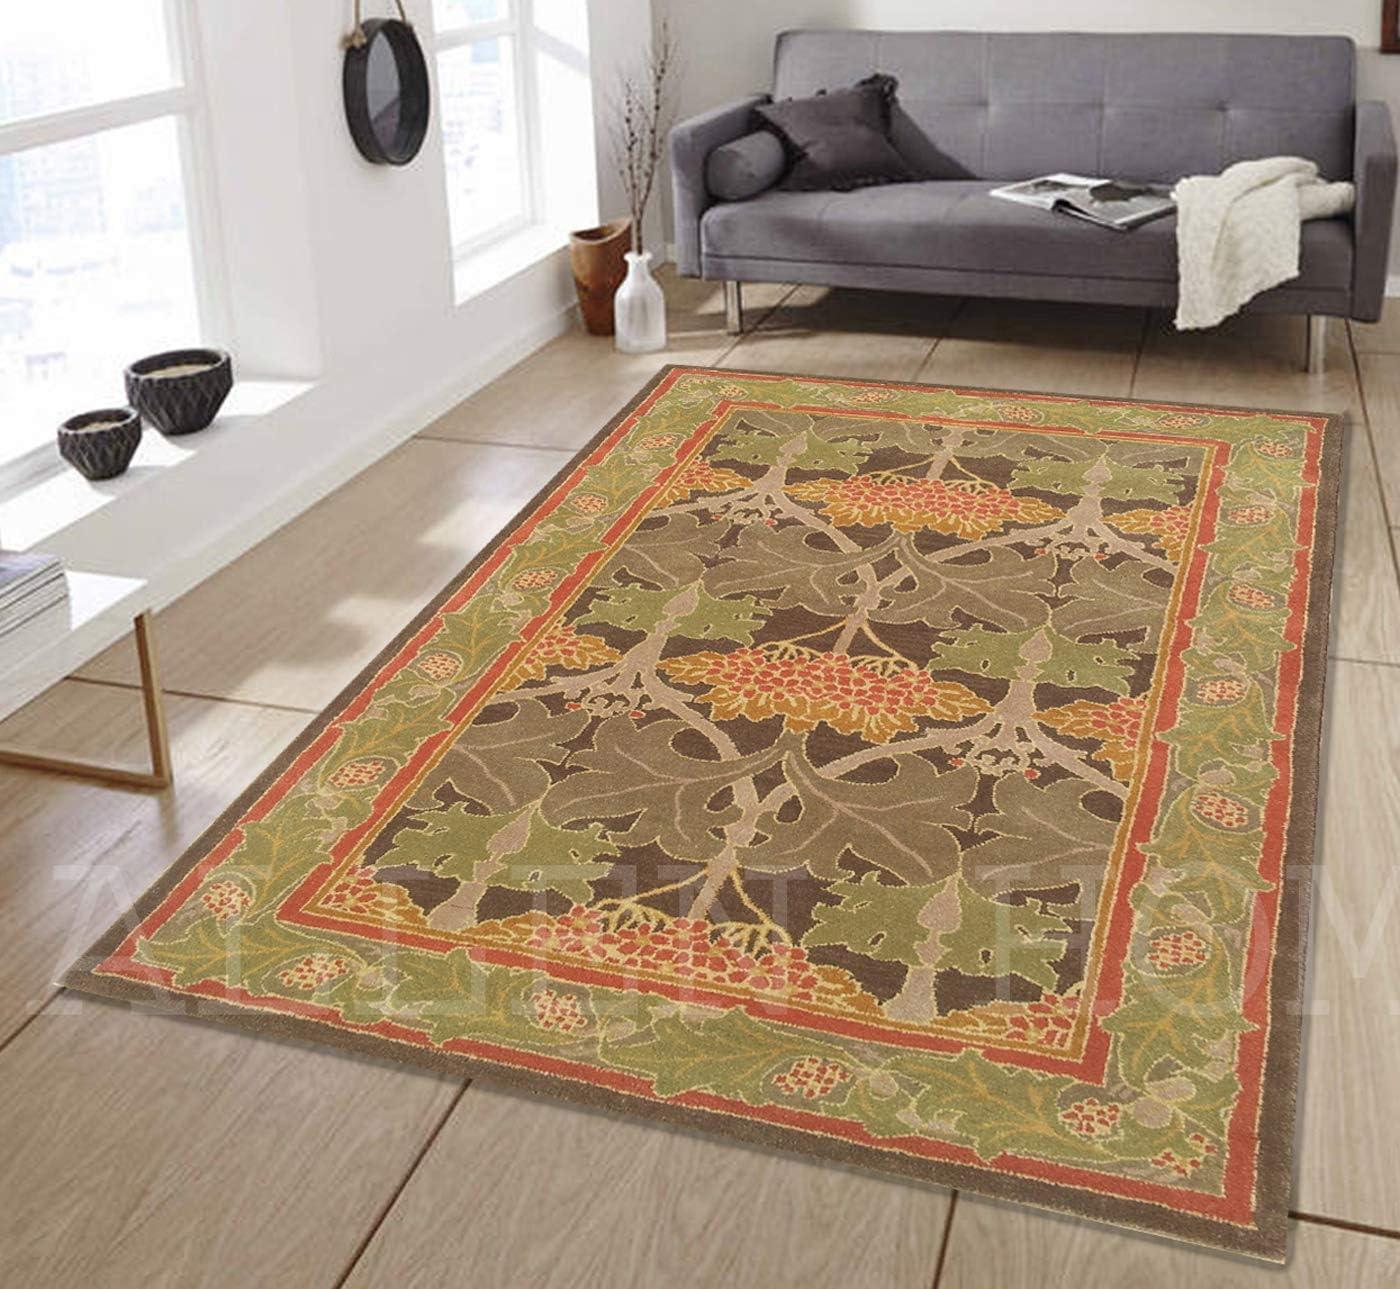 Allen Home Wool Rug 2.5'X9' 3'X5' 5'X8' 8'x10' 9'X12' Mariya Green Tufted William Morris Art and Crafts Persian Traditional Wool Rug Carpet (6'X9')